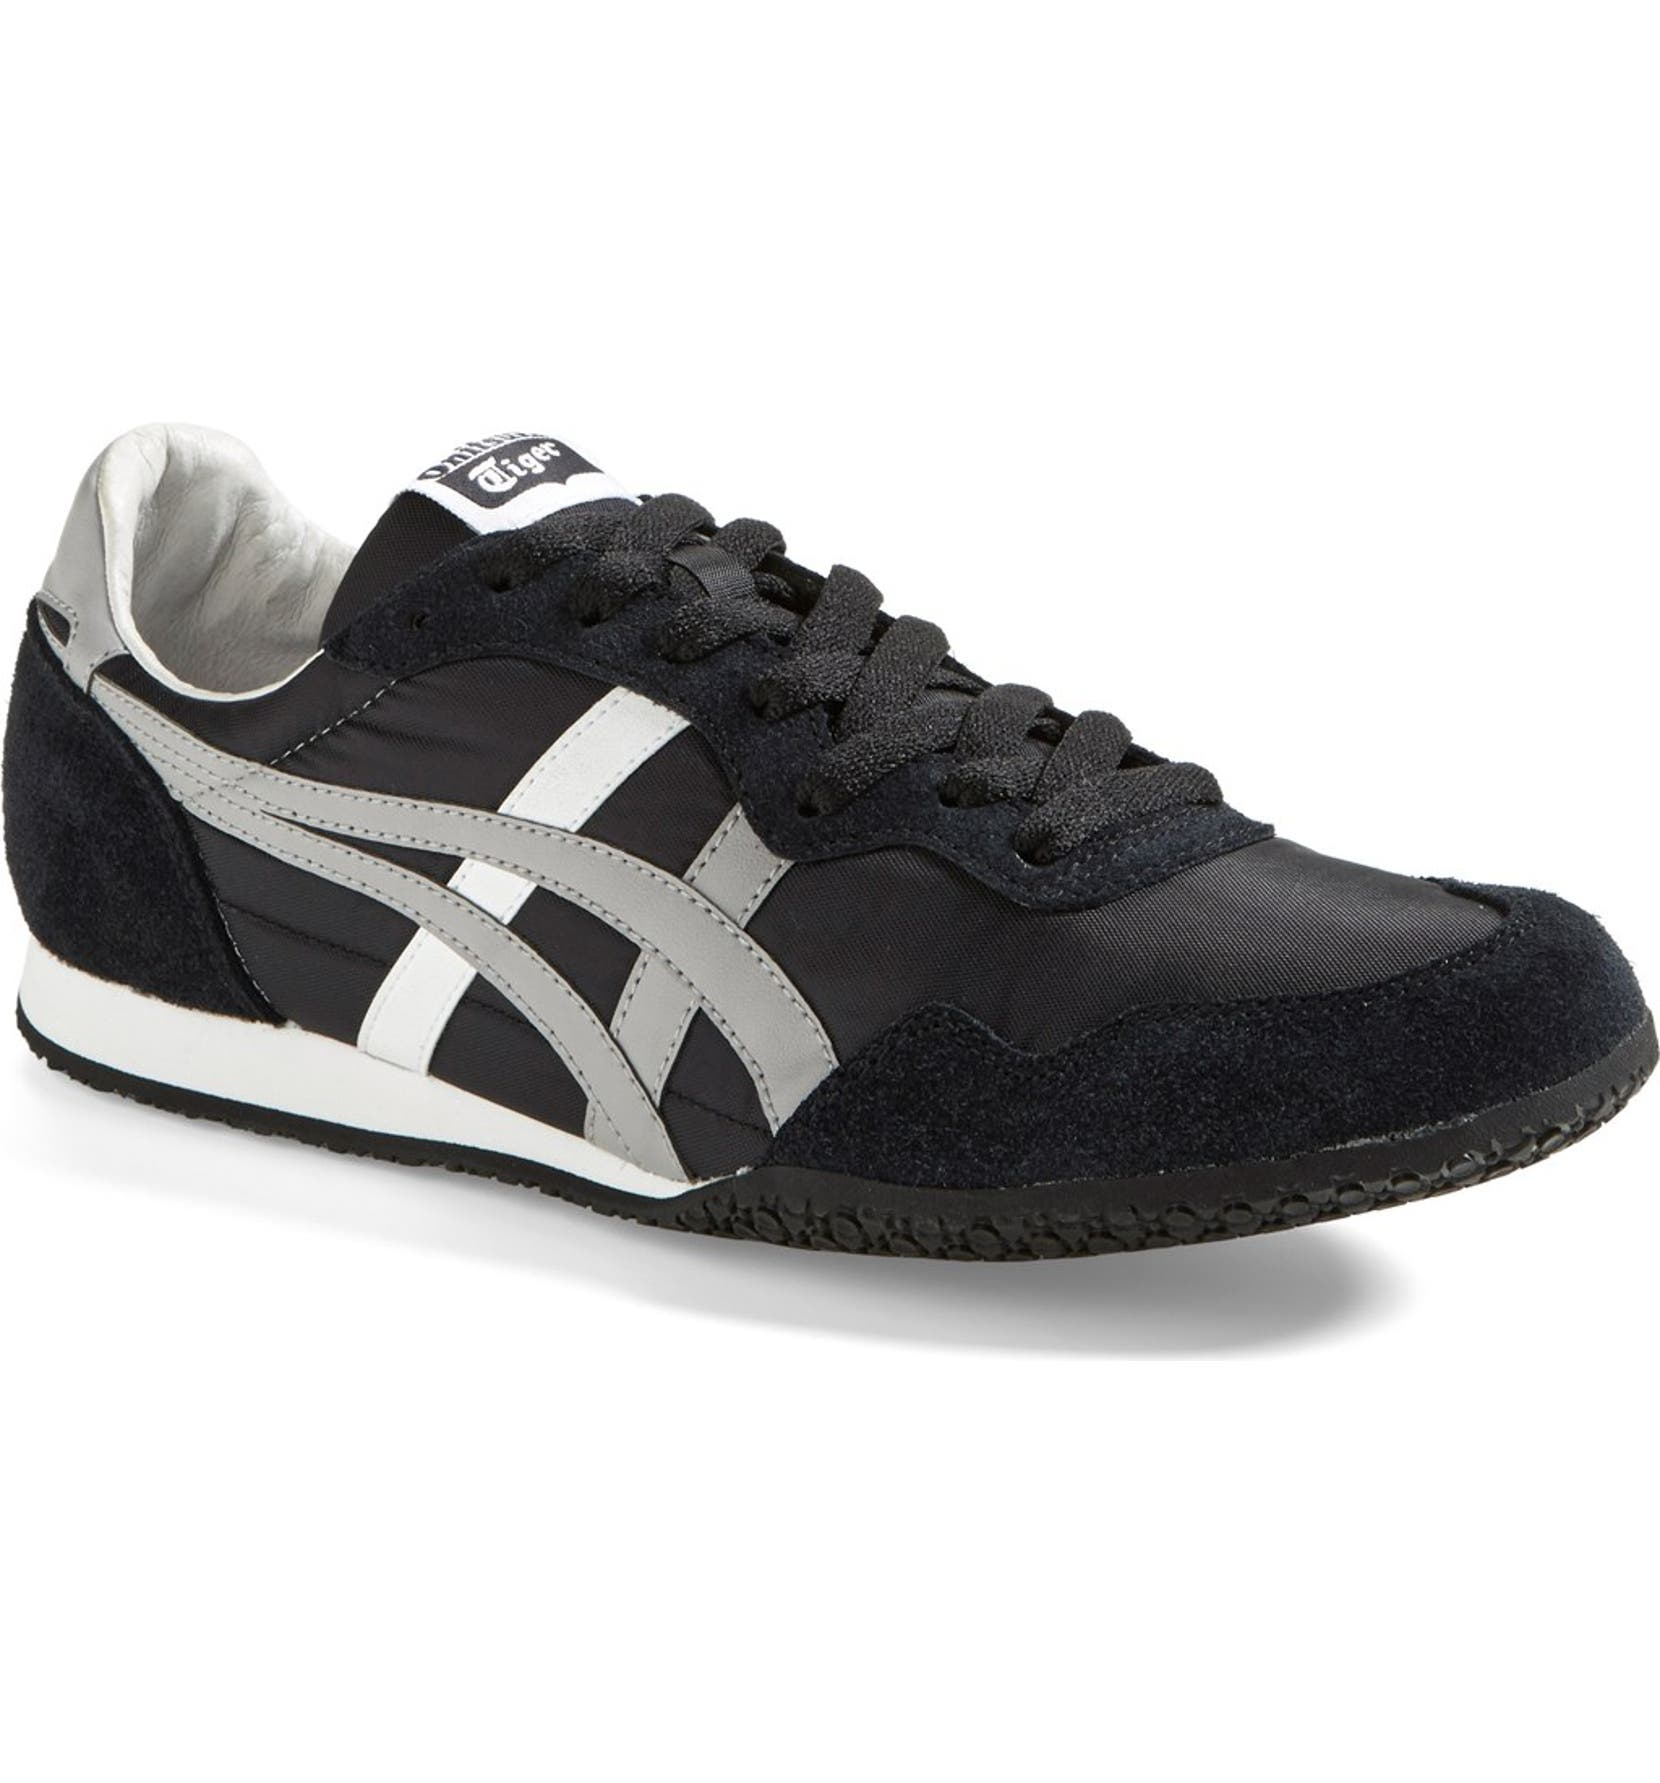 buy online 10d32 c9f12 'Serrano' Sneaker